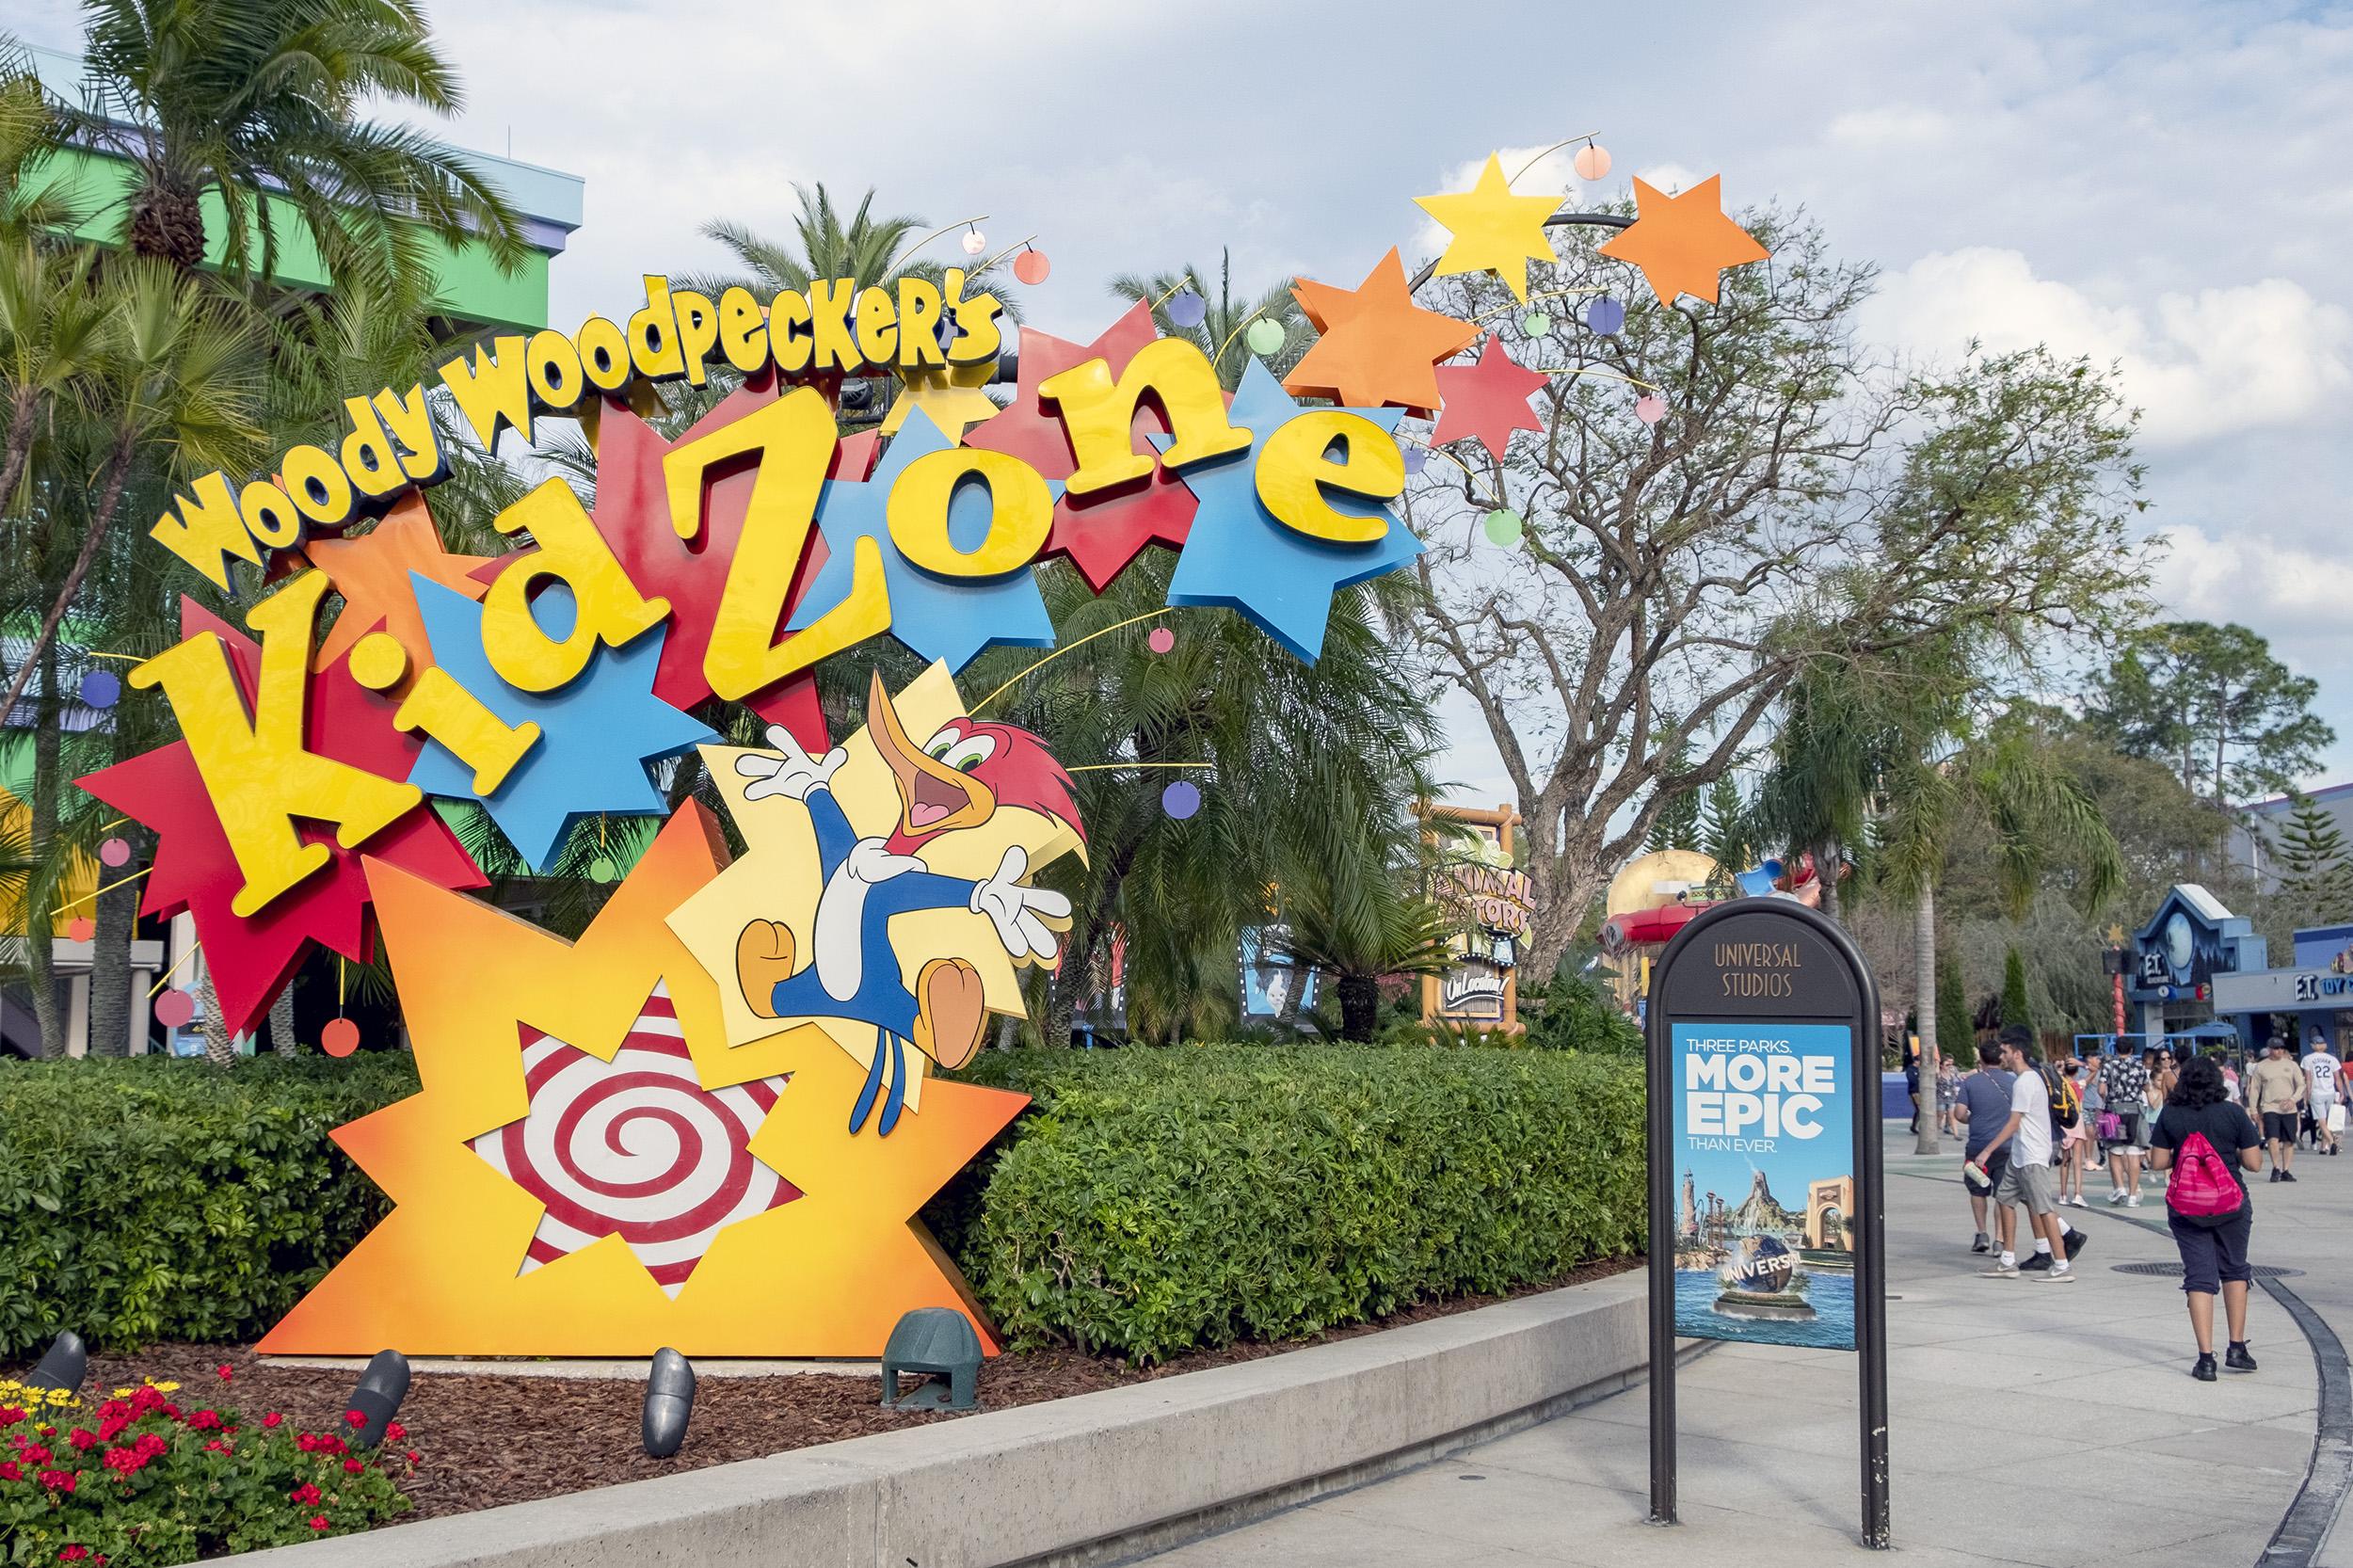 Woody Woodpeckers Kid Zone Universal Studios Florida